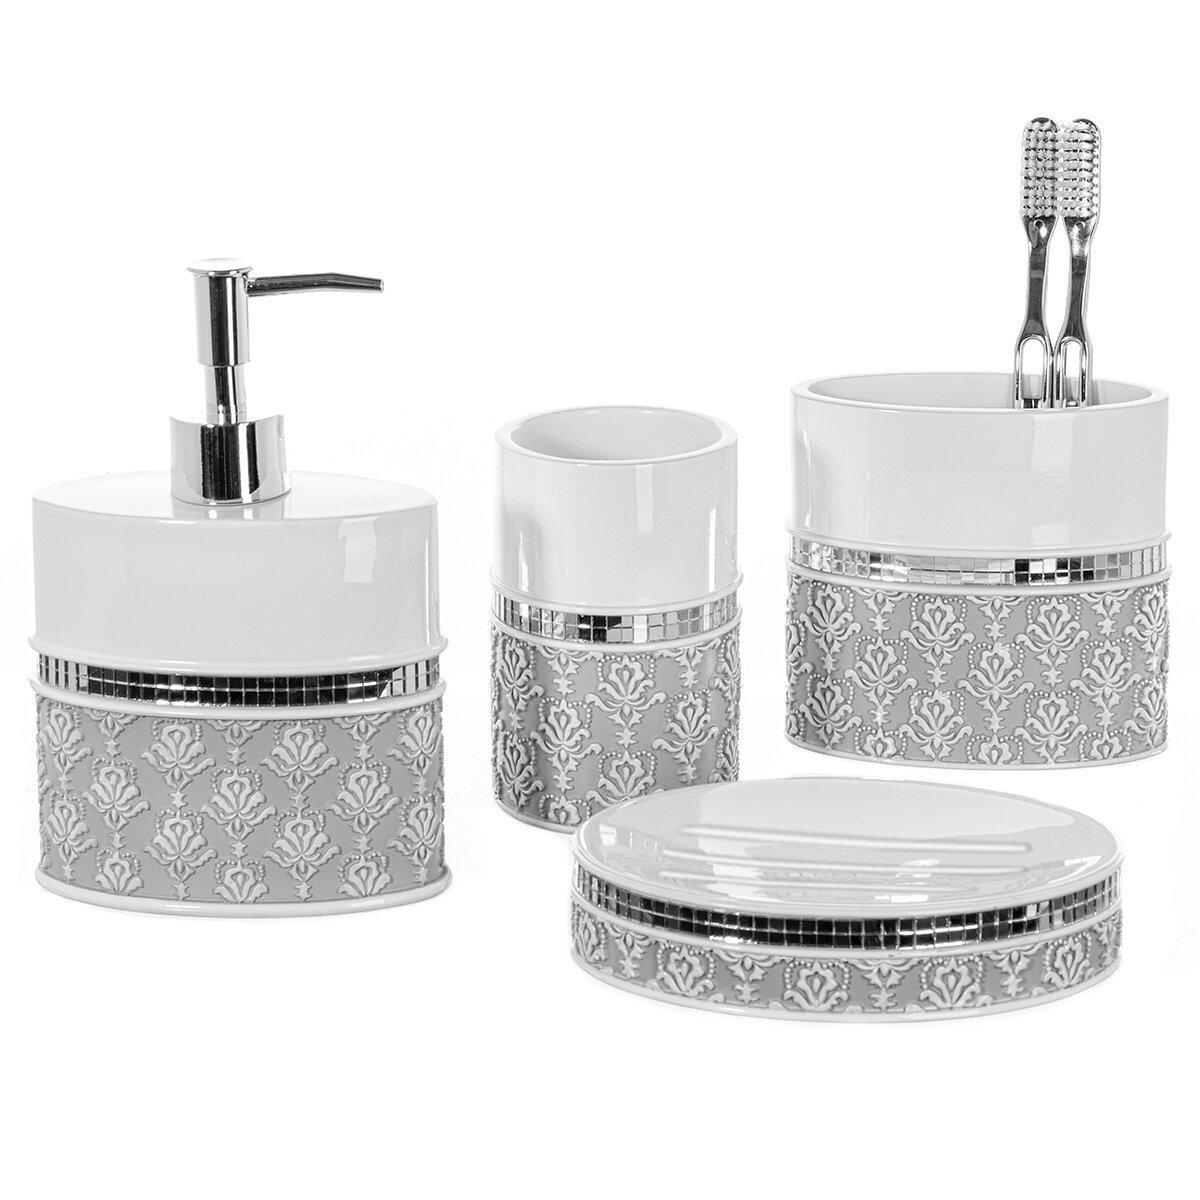 Creative scents 4 piece bathroom accessory set for Bathroom 4 piece set